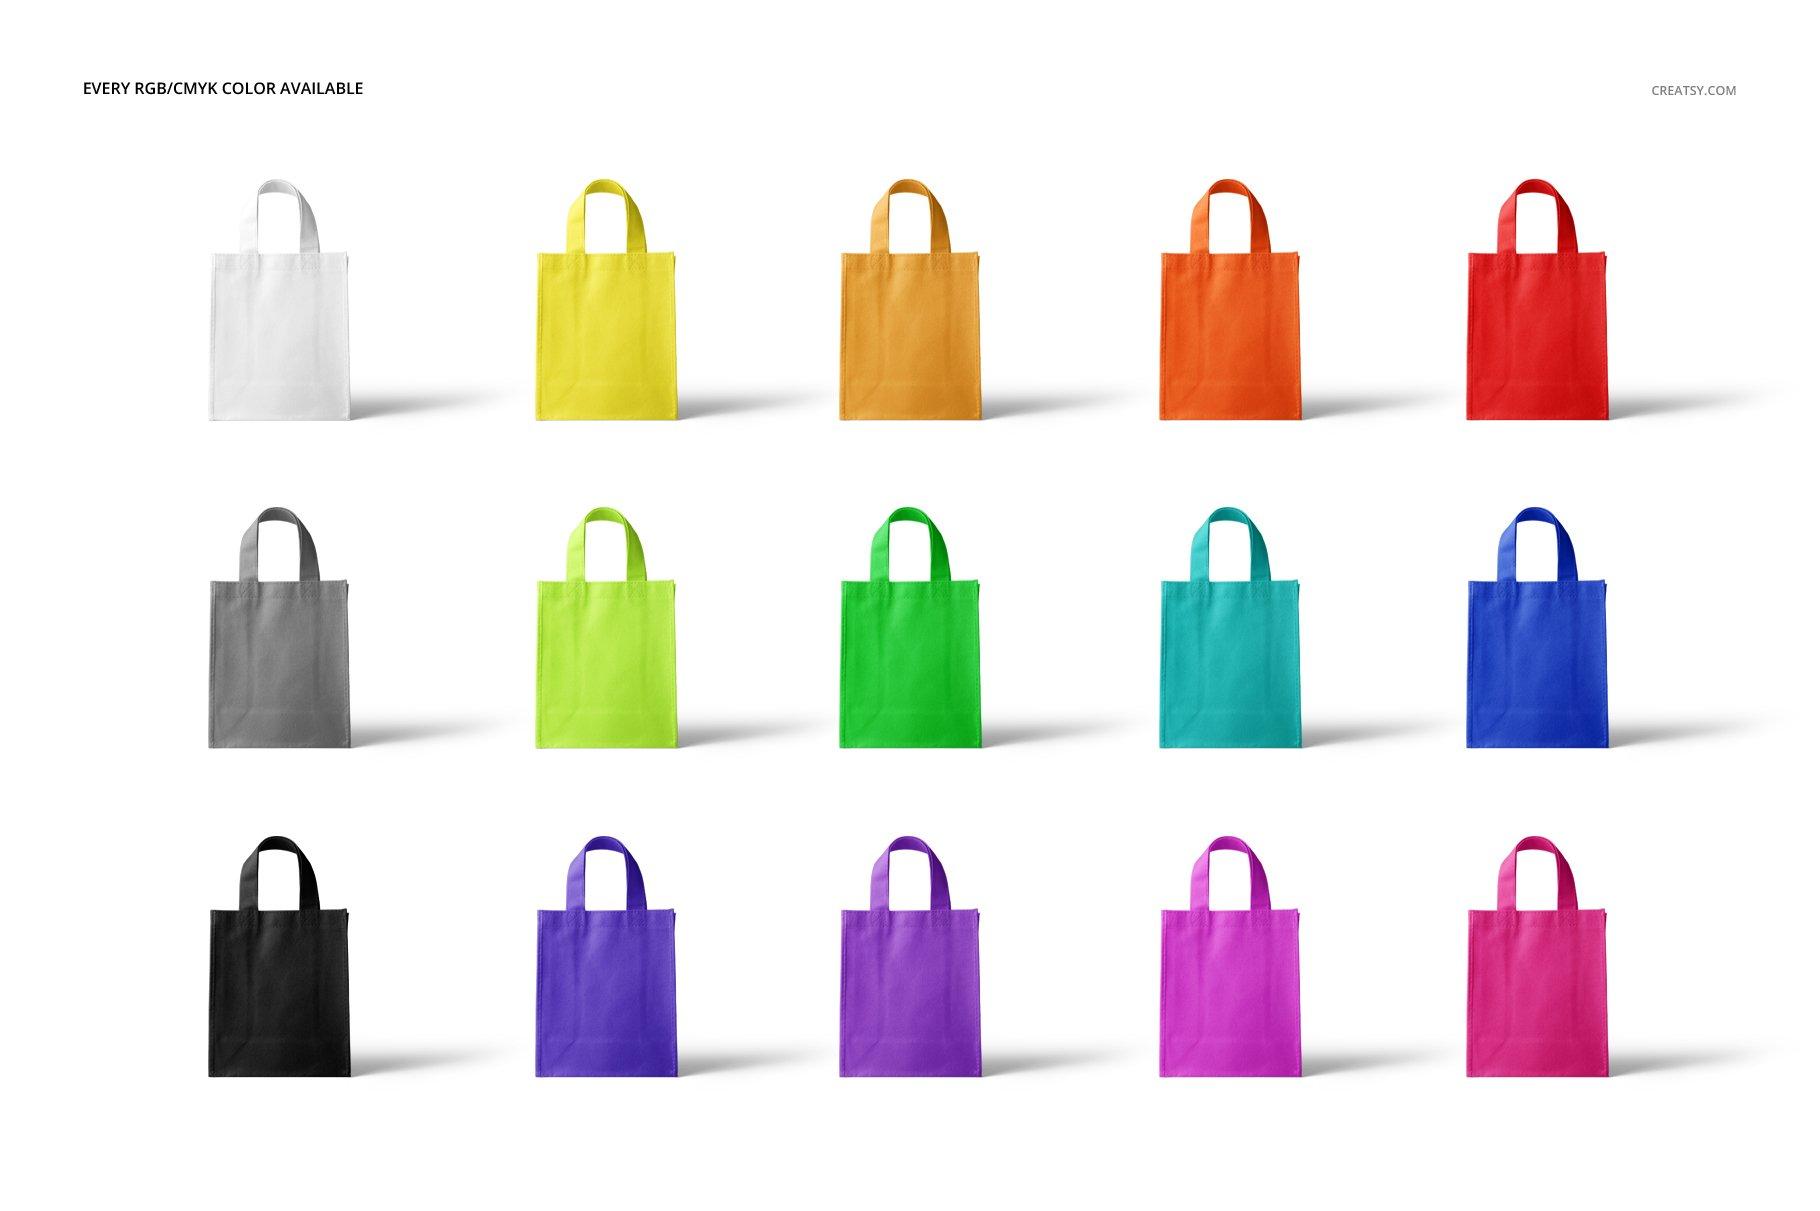 [淘宝购买] 无纺布袋手提袋设计展示样机模板套装 Non-Woven Tote Bag Mockup Set插图(2)